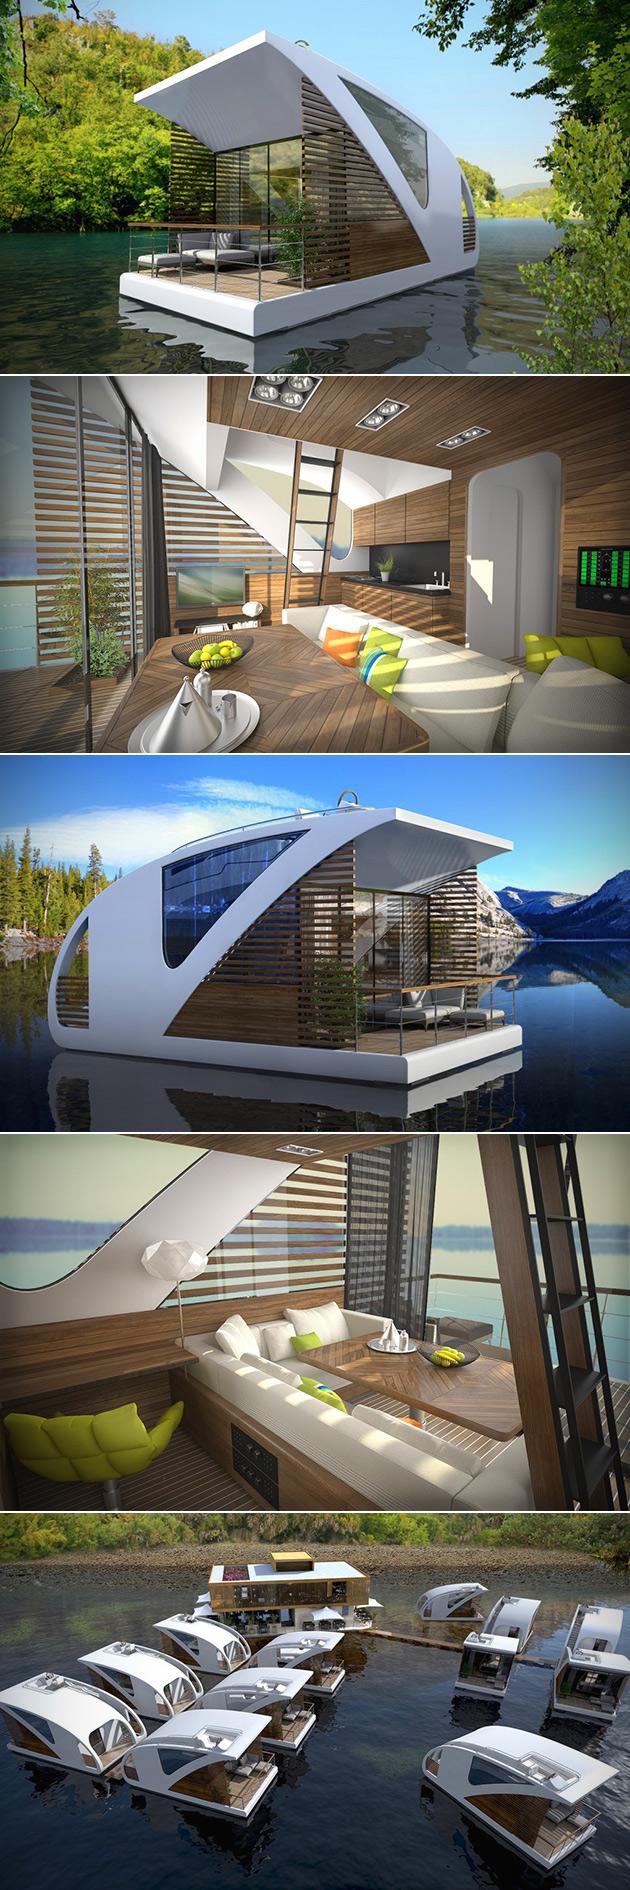 Floating Hotel Catamaran